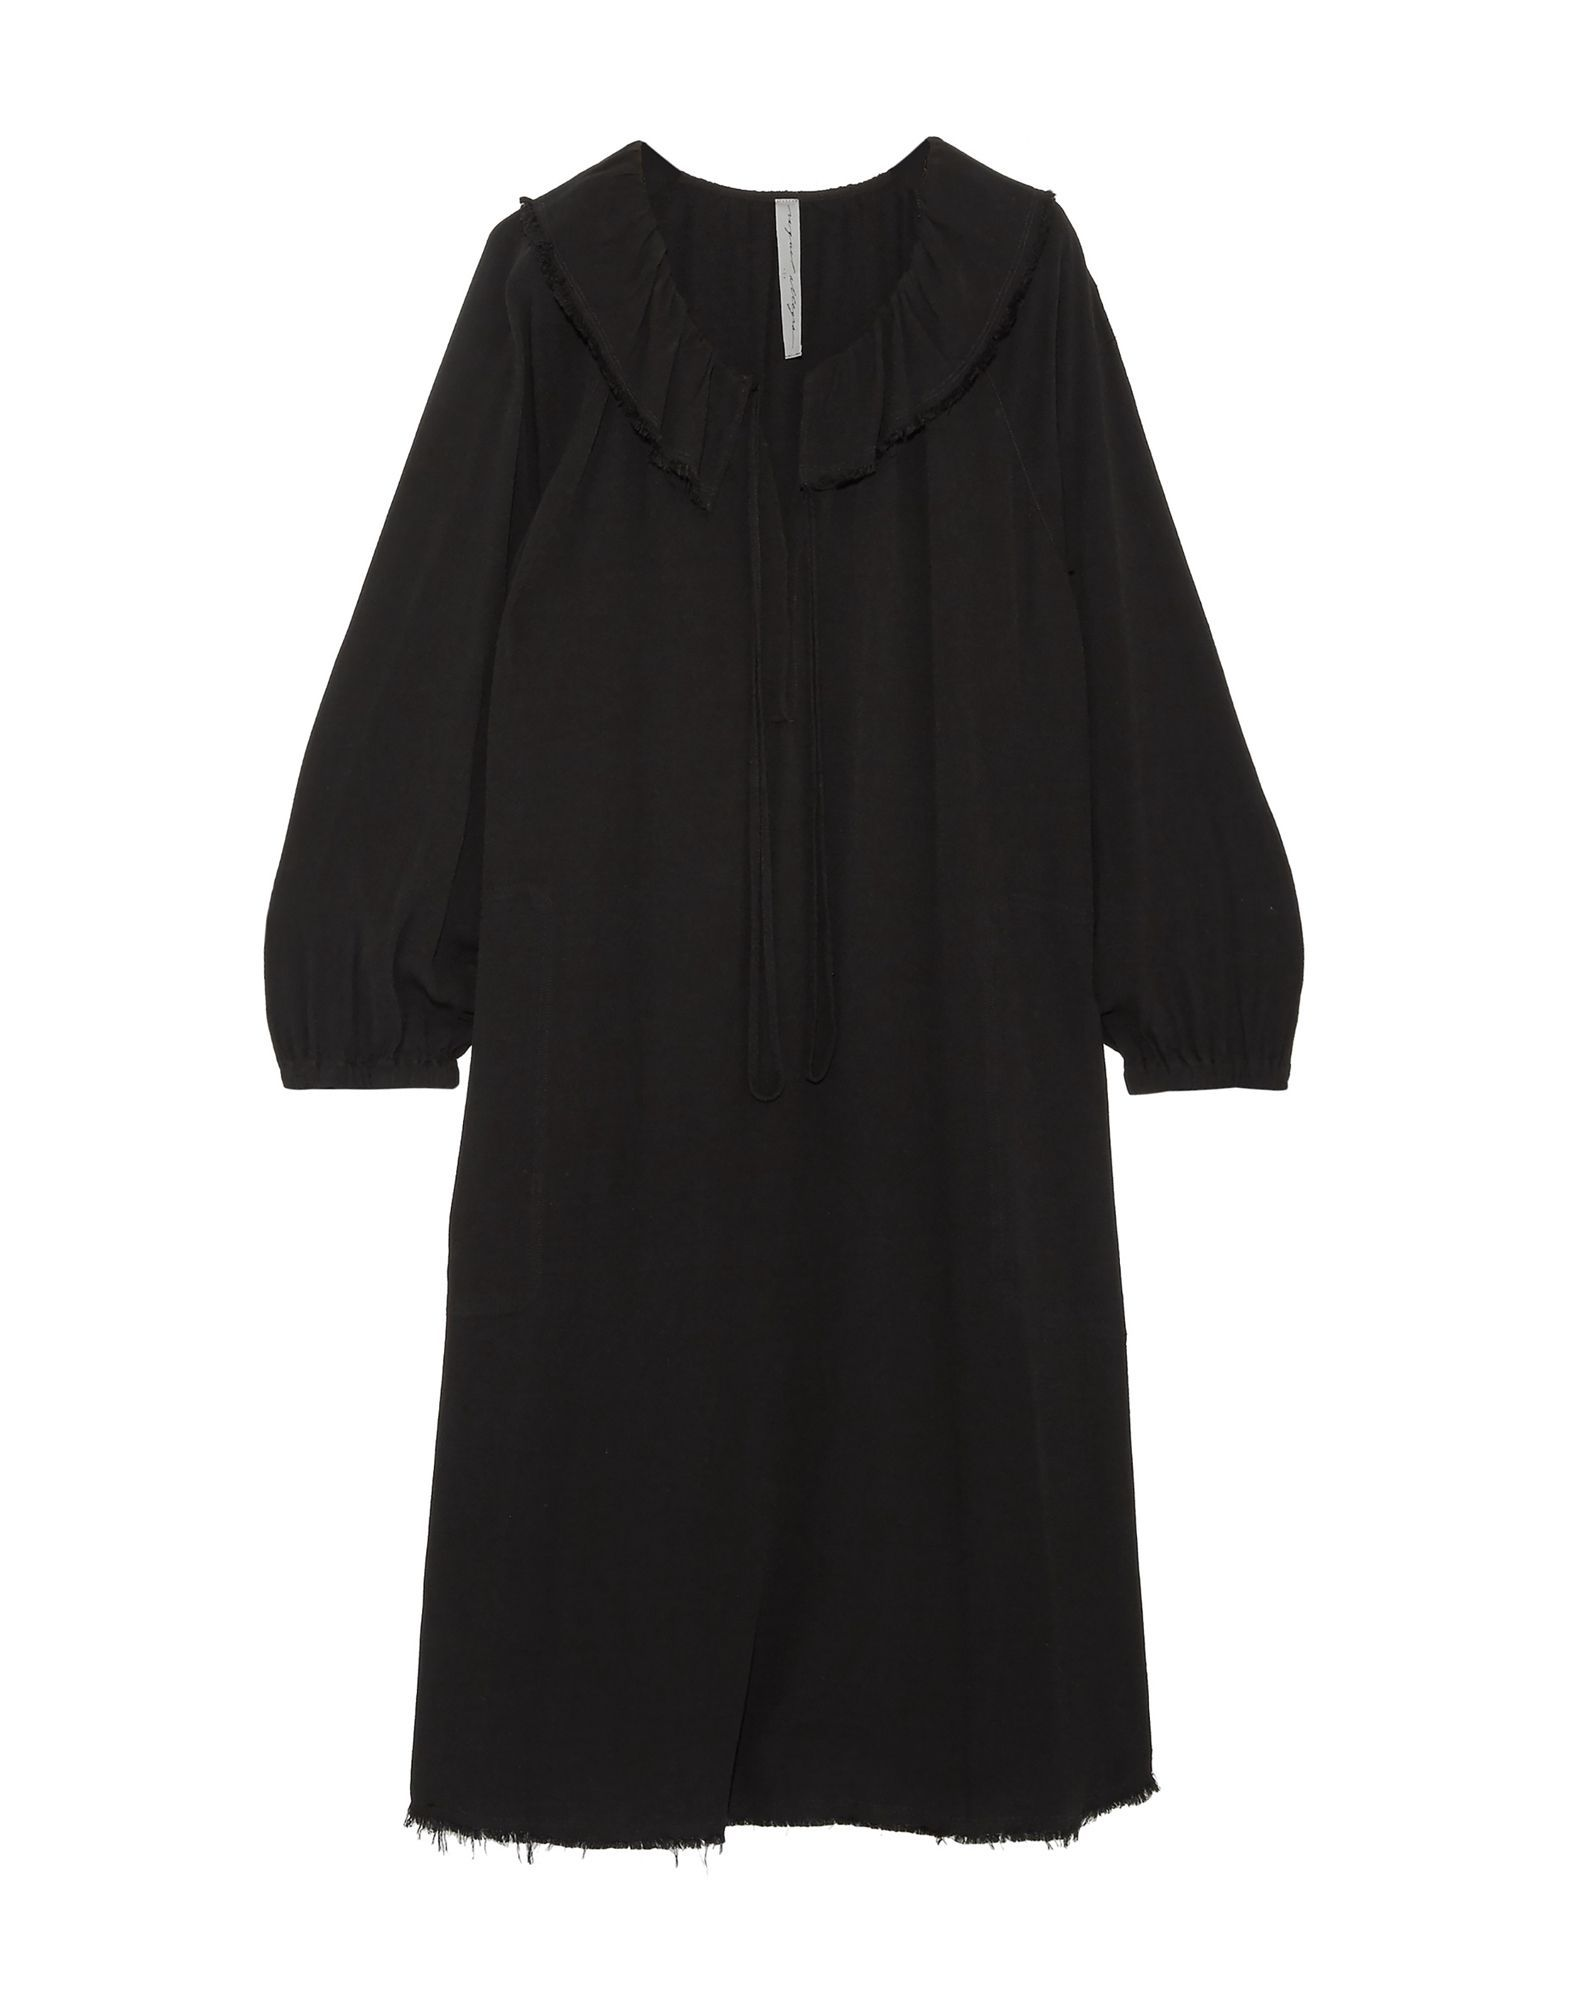 DRESSES Woman Raquel Allegra Black Rayon